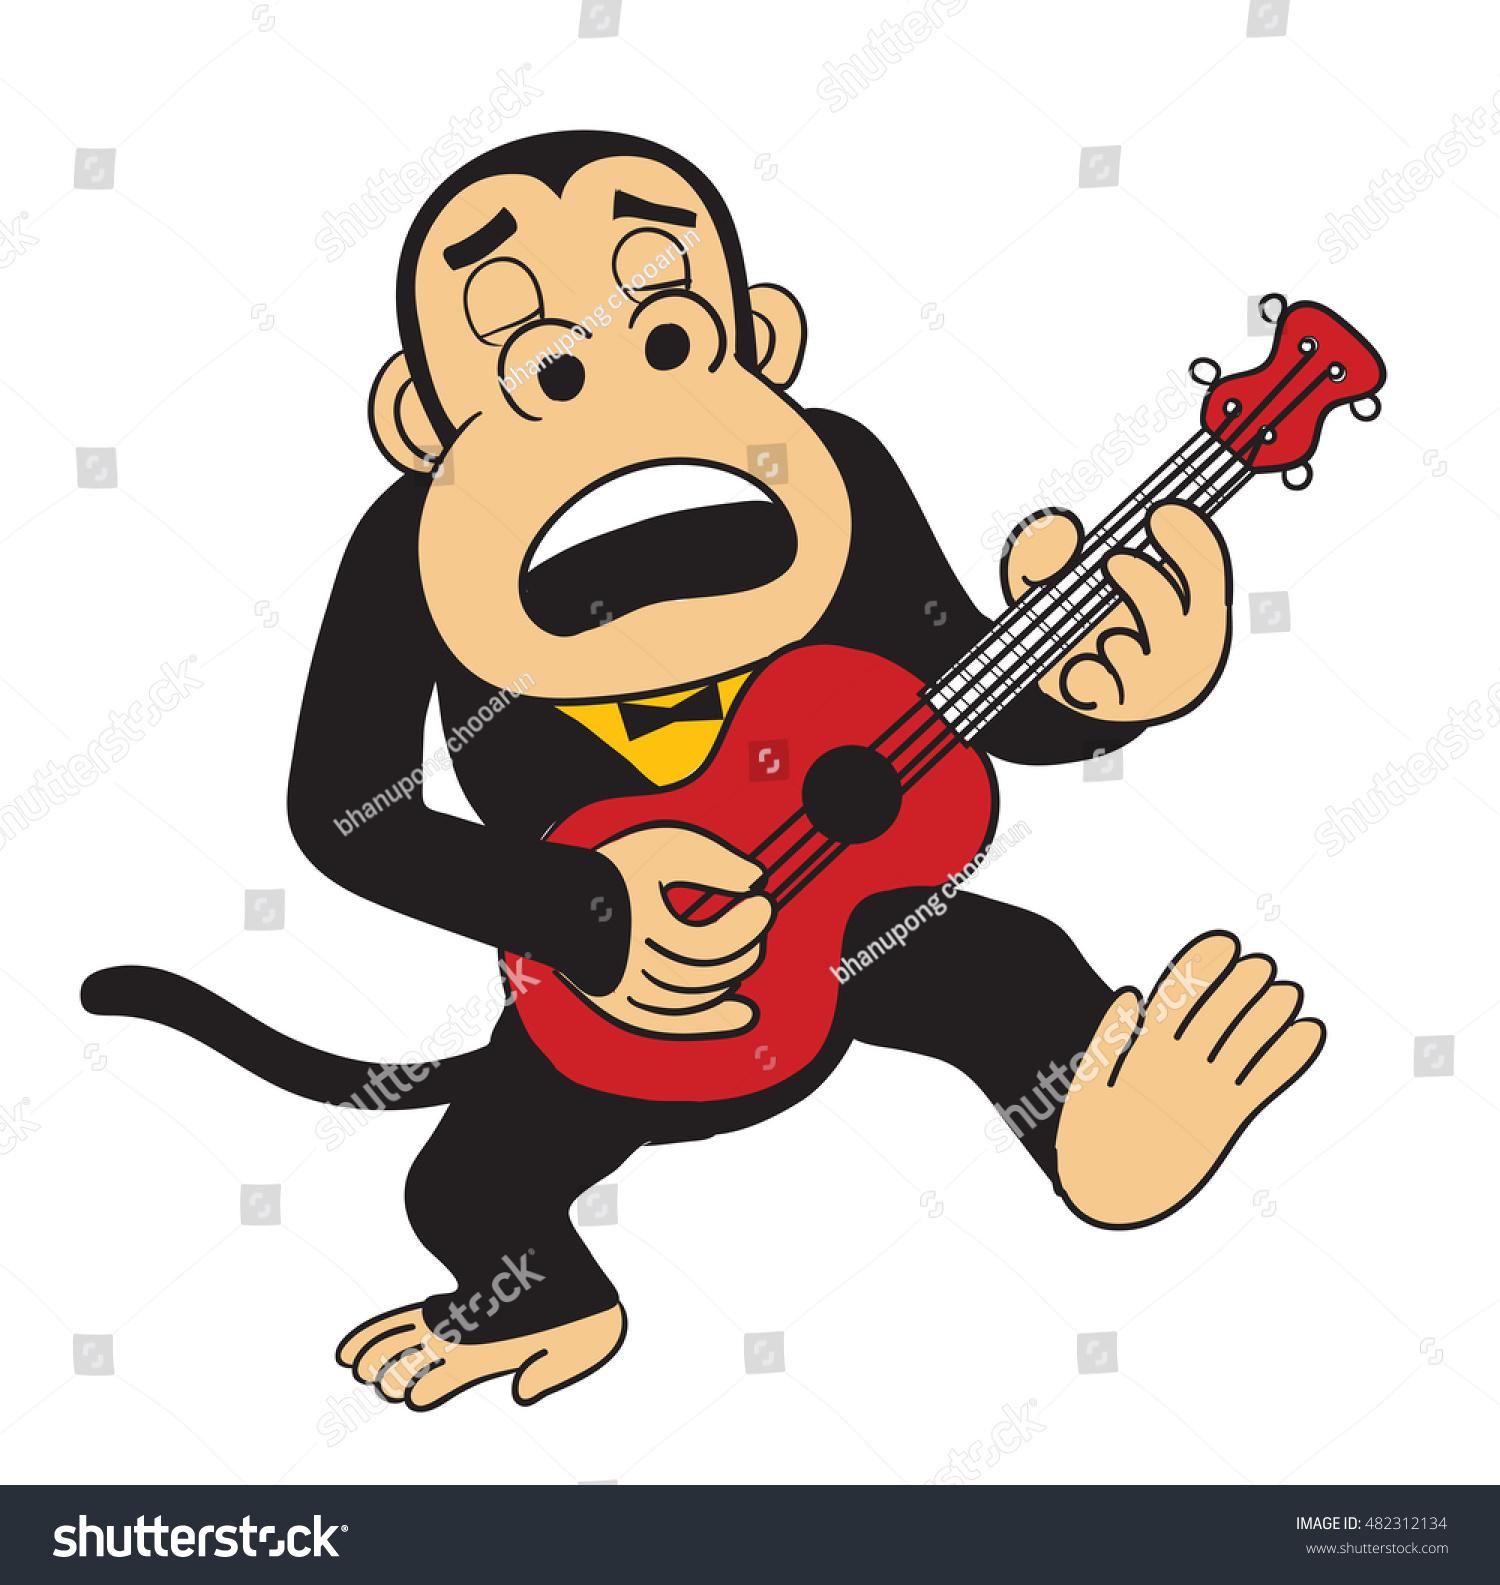 Monkey Playing Ukulele Vector Stock Vector Royalty Free 482312134